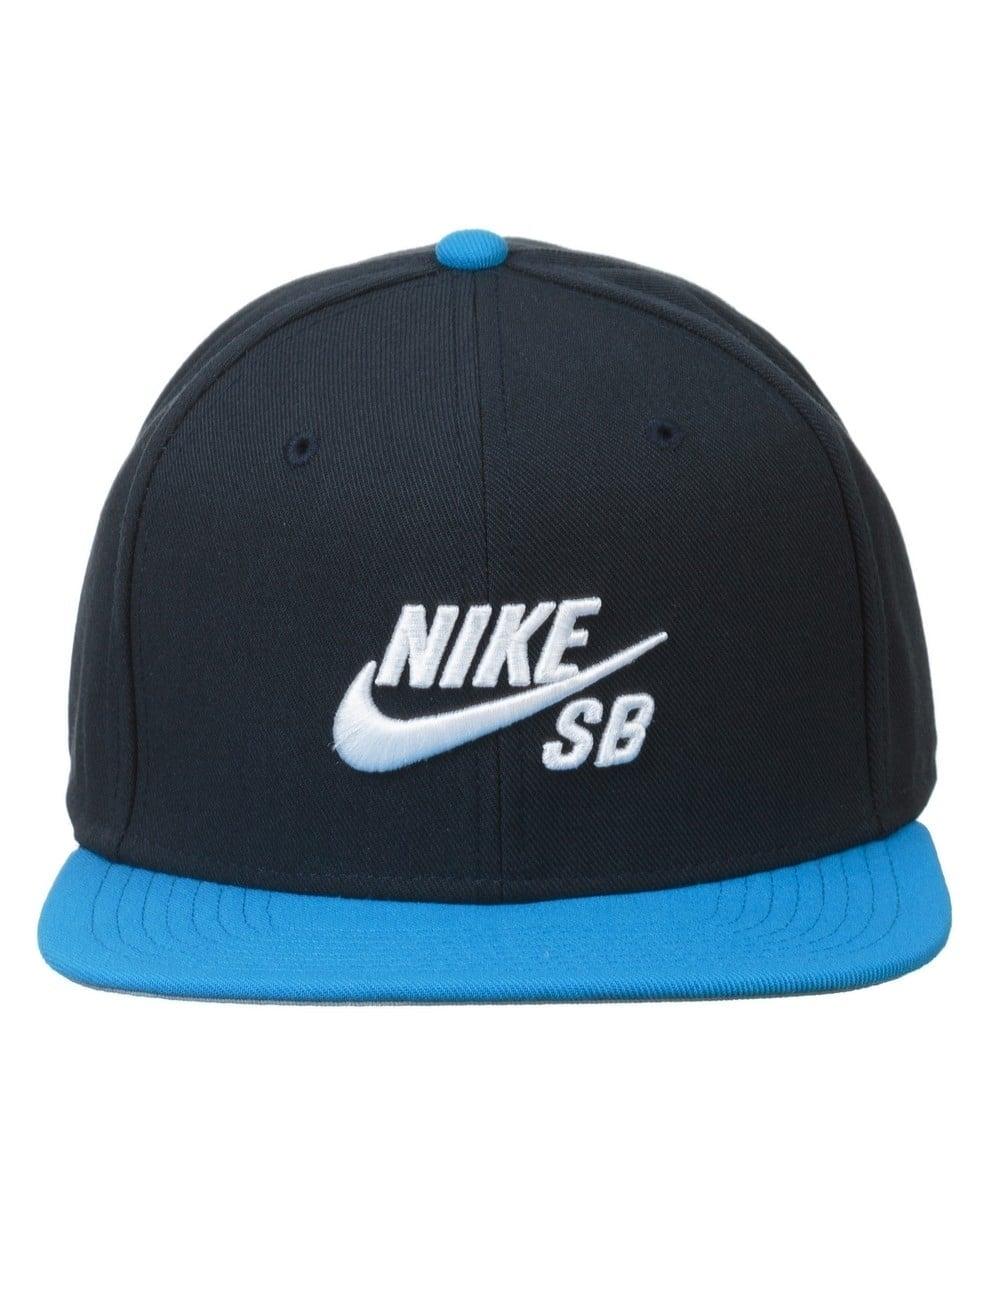 cd6d8c9cb856 france nike sb hats icon pro snapback cap teal 077de cf9c3  spain blue nike  cap online off79 discounts e36fe 7560e